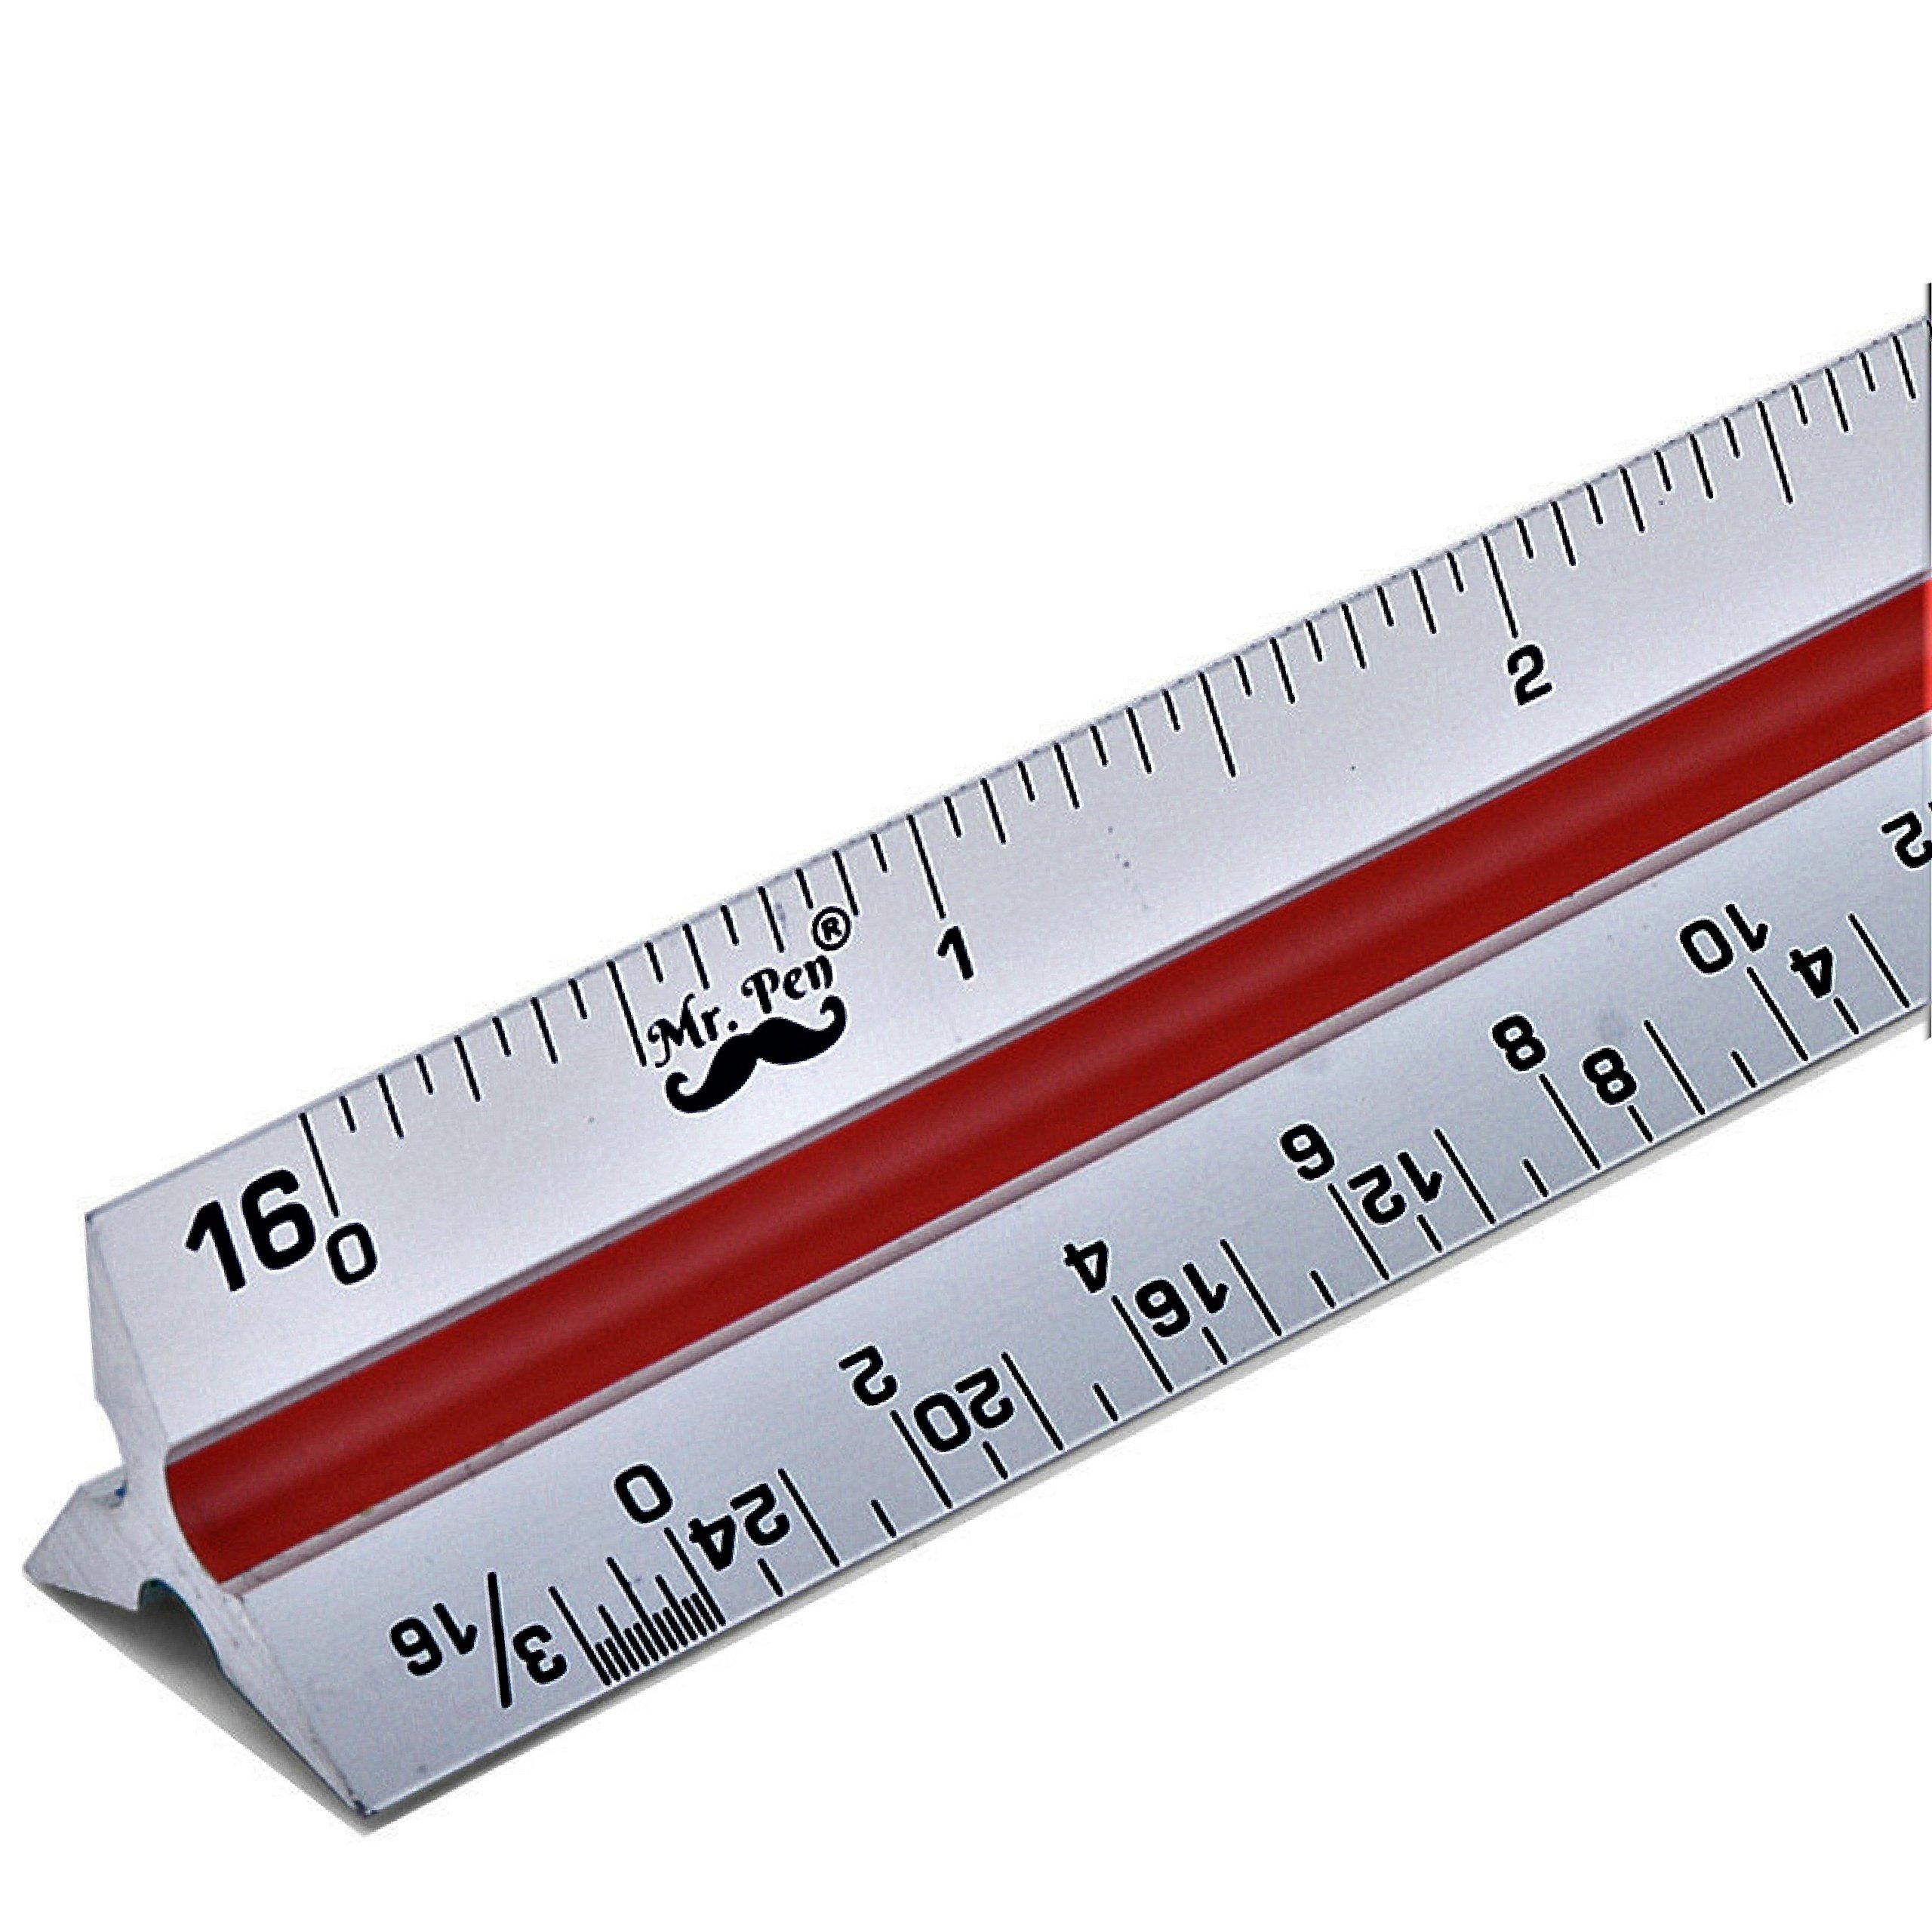 Mr. Pen - Architectural Scale Ruler, 12'' Aluminum Architect Scale, Triangular Scale, Scale Ruler for Blueprint, Triangle Ruler, Drafting Ruler, Architect Ruler, Metal Scale Ruler, Architecture Ruler